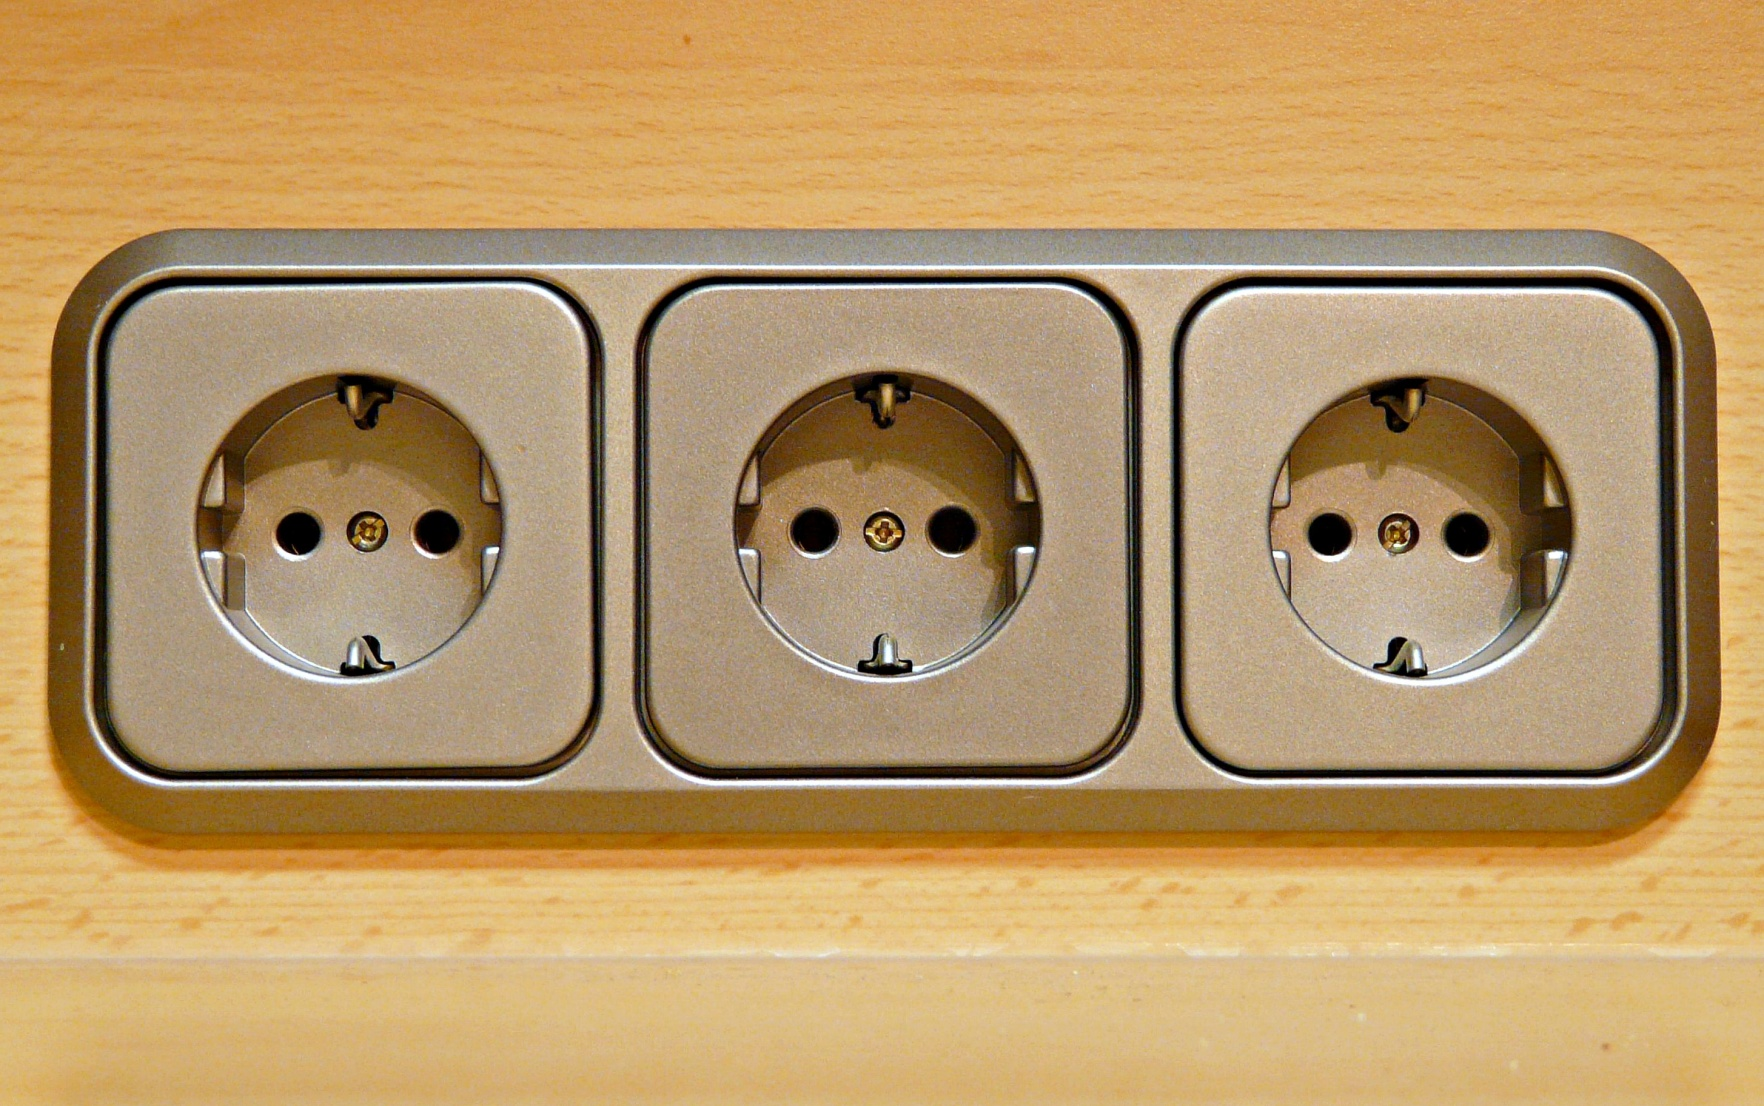 Norway electric socket